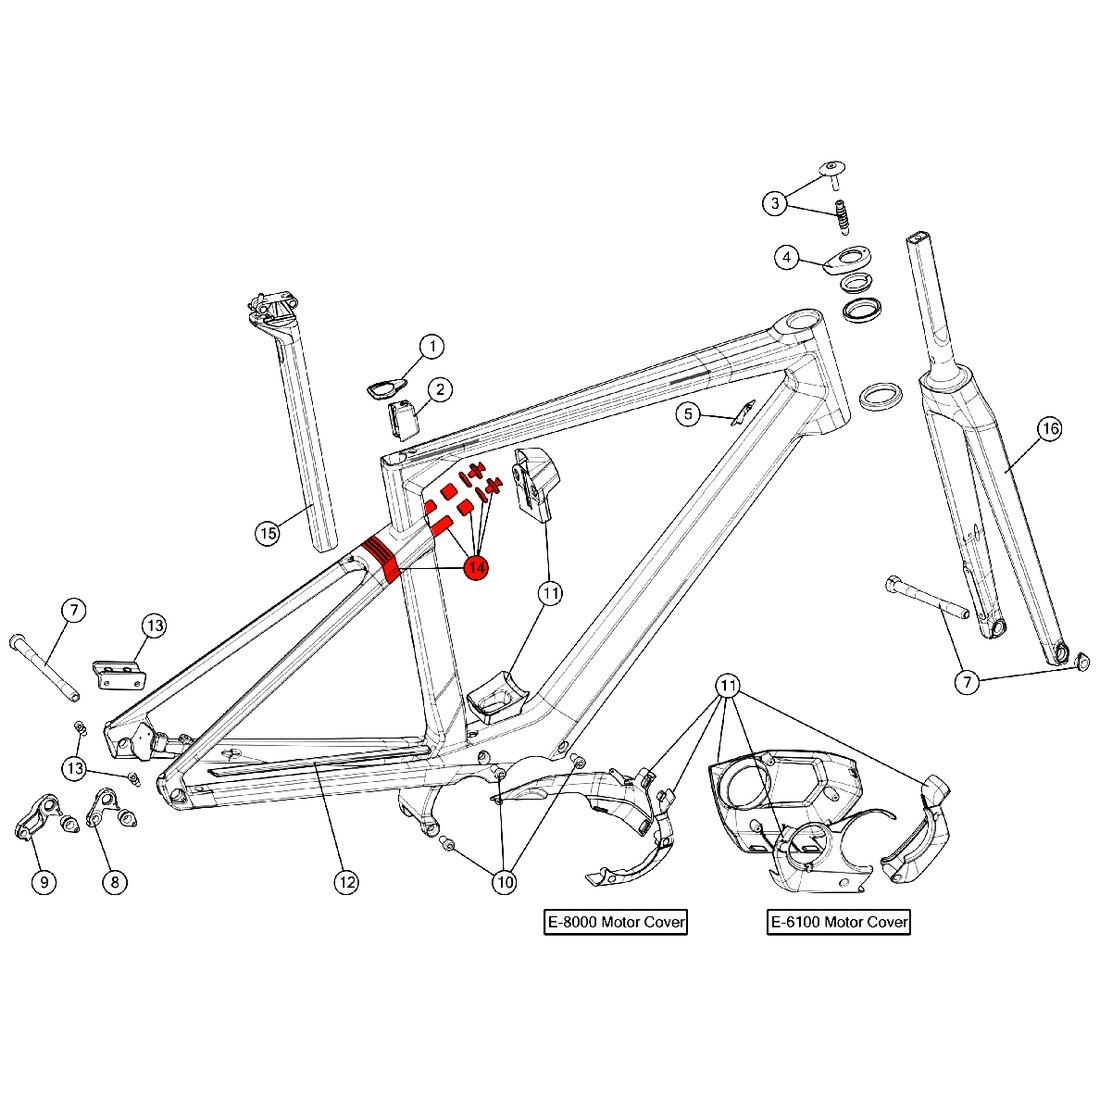 BMC Suspension Kit for Alpenchallenge AMP (MY 2019) - 301671